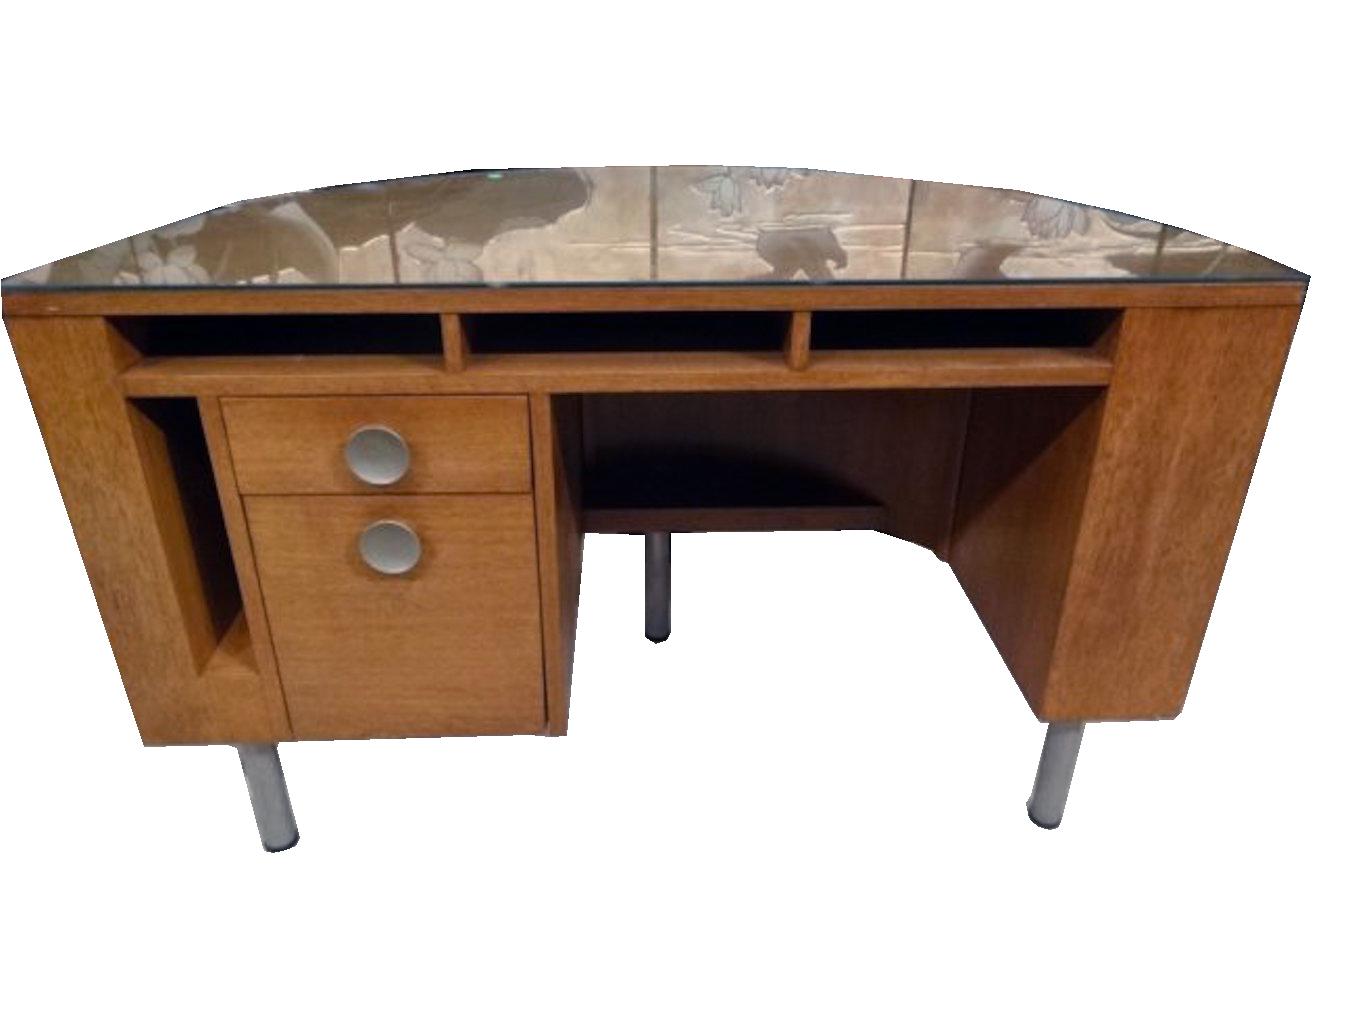 Delicieux Gilbert Rohde Demi Lune Desk For Herman Miller